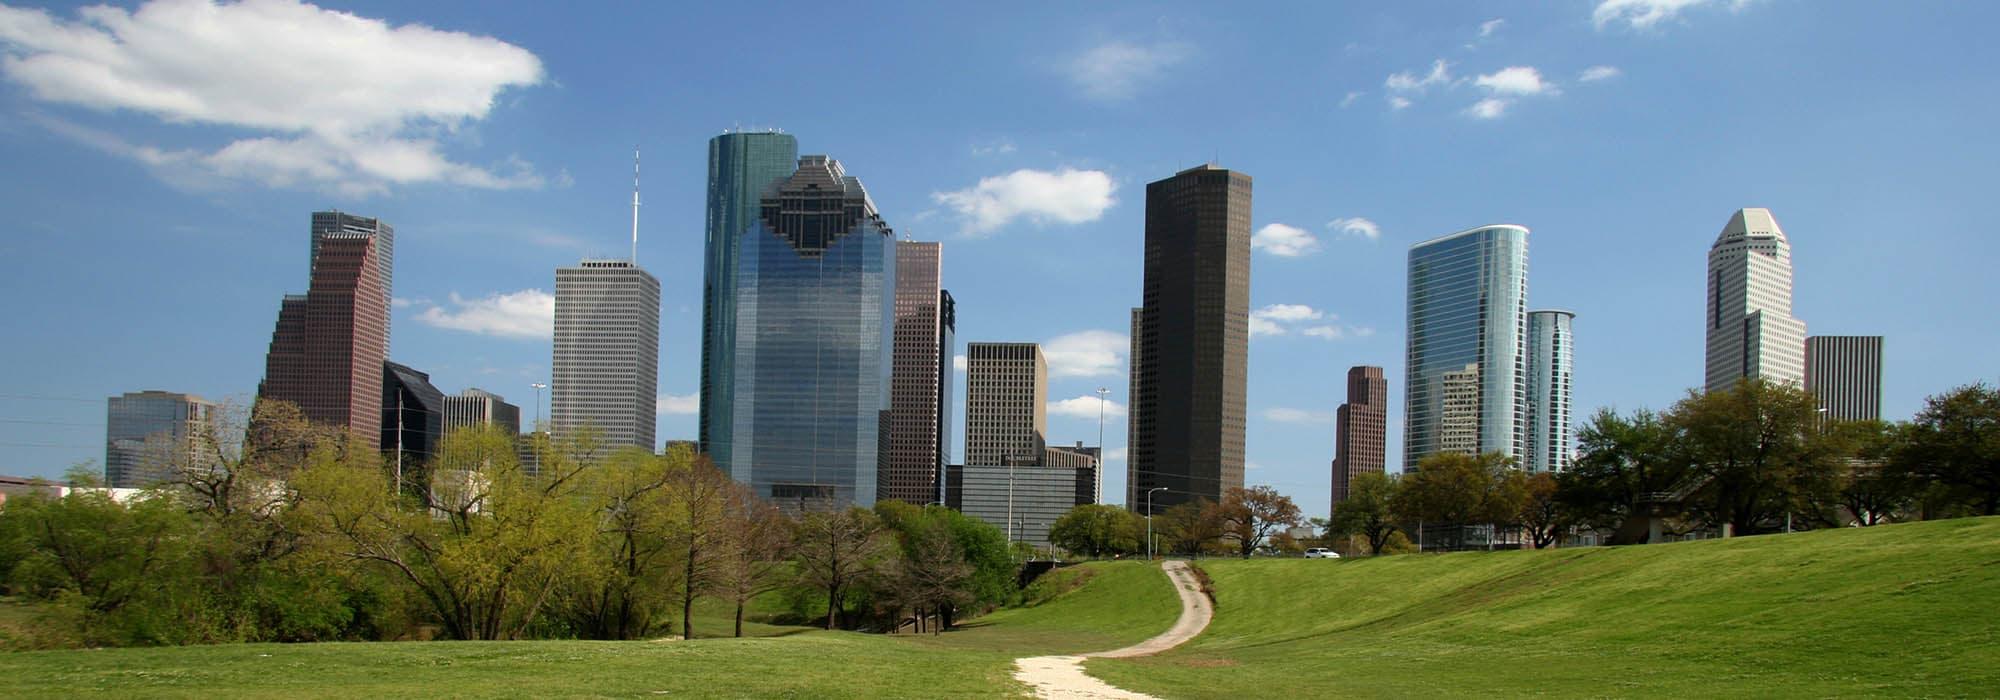 Apartments in Houston, TX